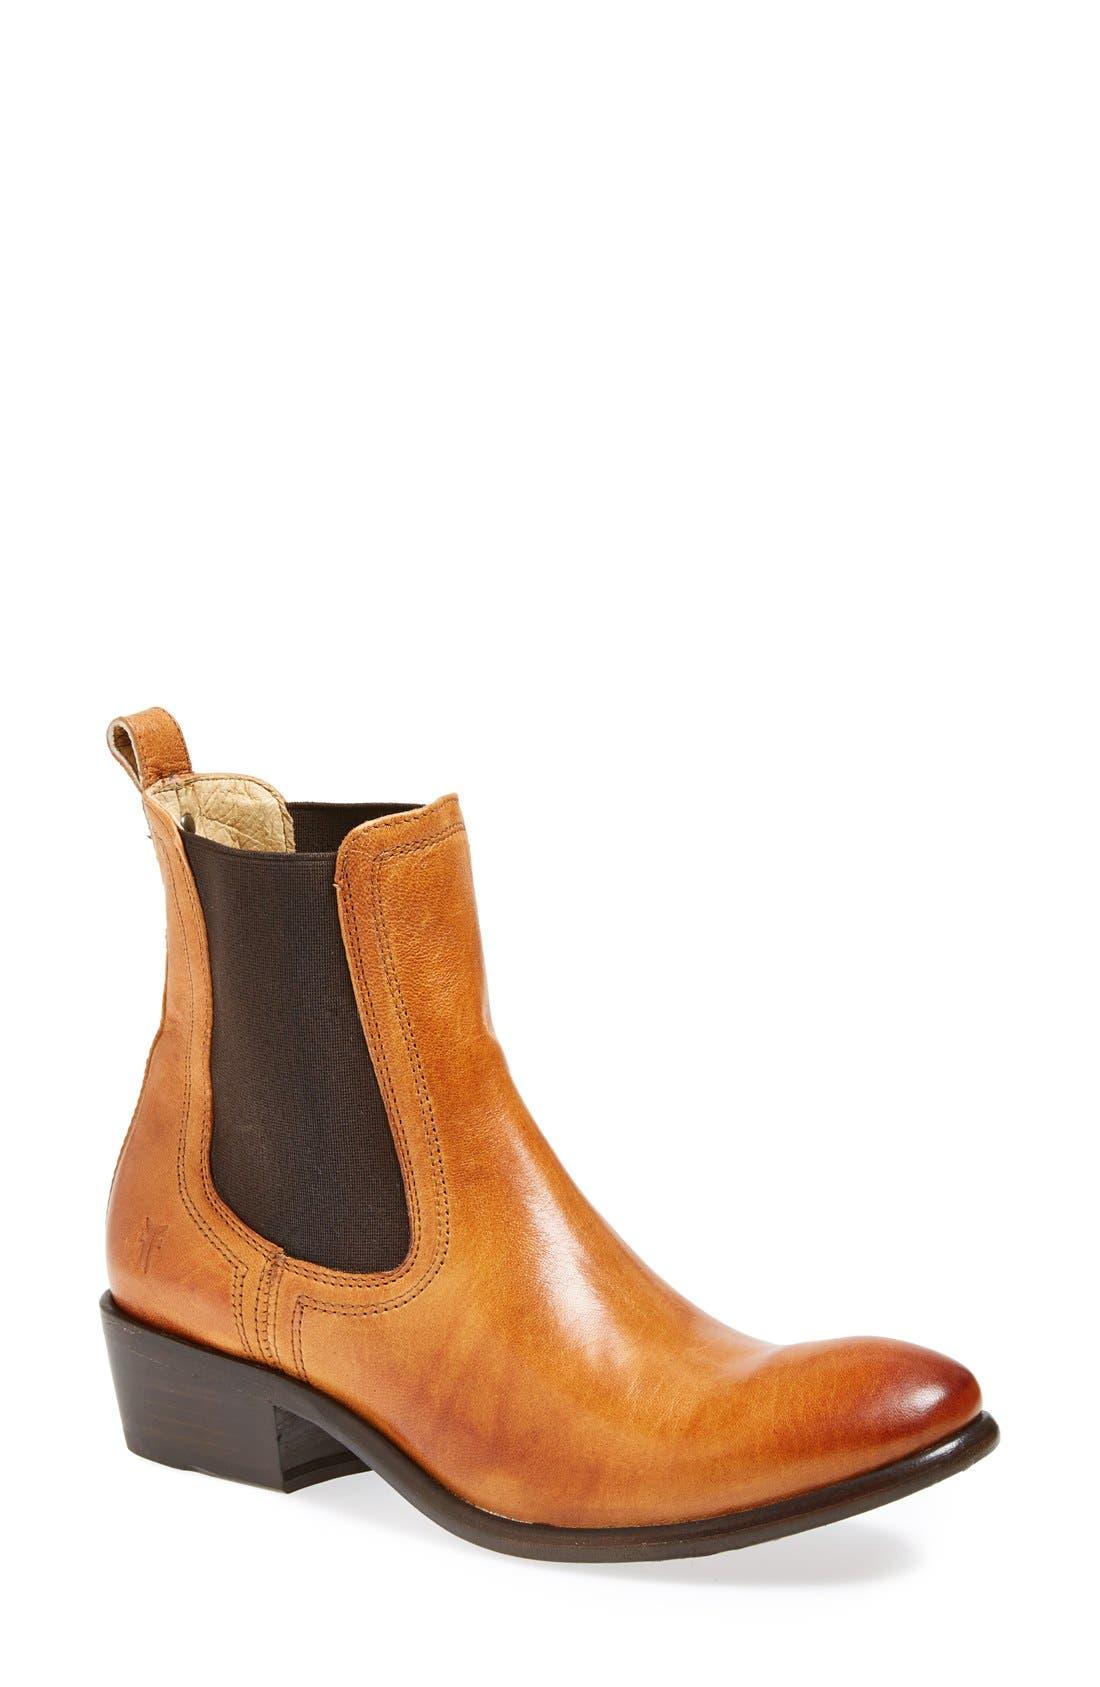 Main Image - Frye 'Carson' Chelsea Boot